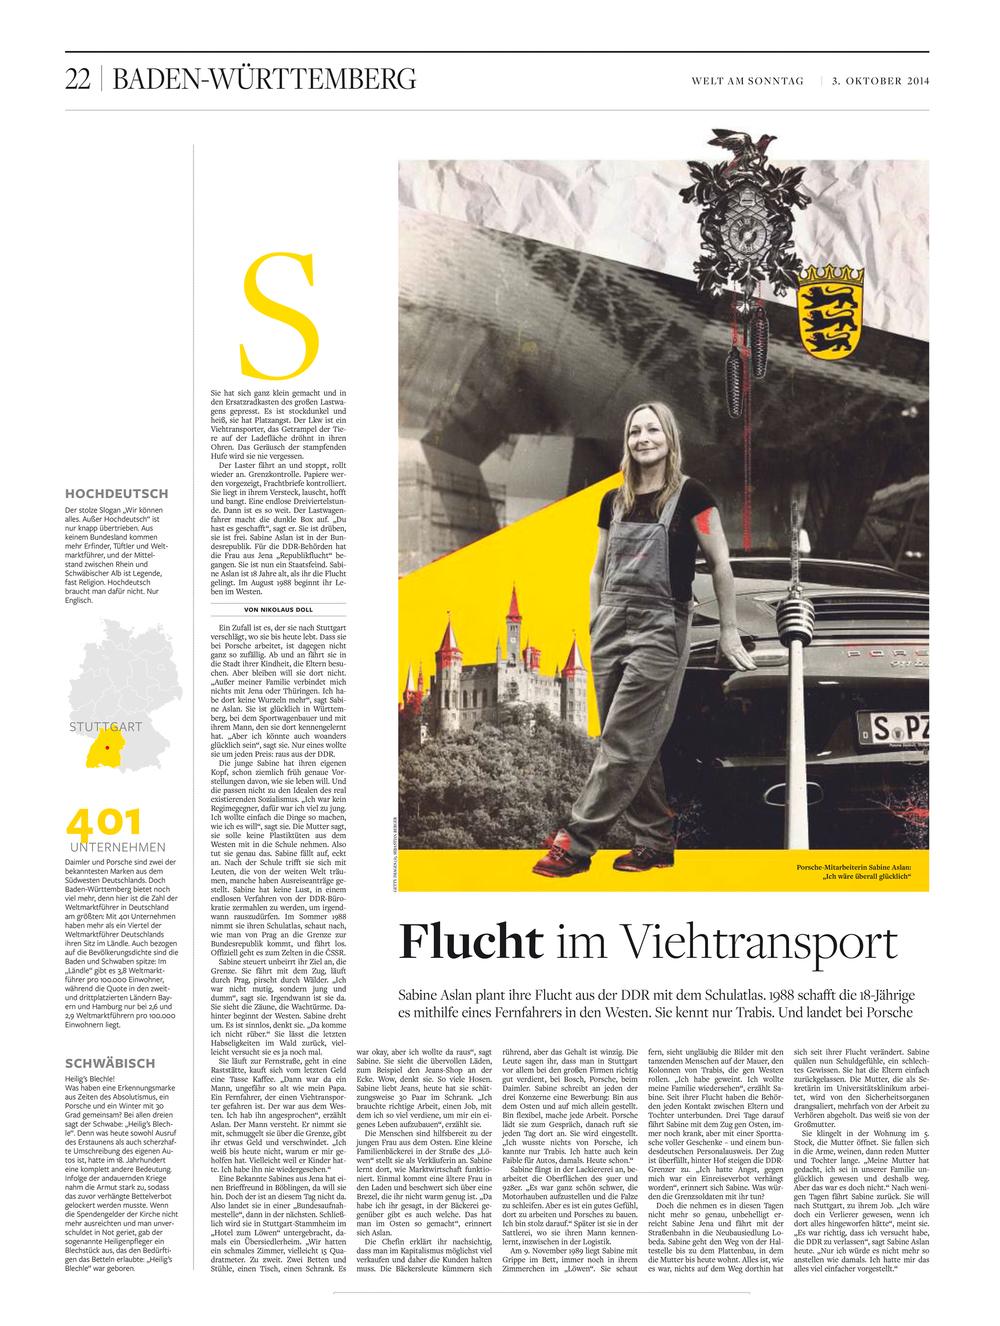 Sabine-Aslan_Porsche_Pressefotograf-Stuttgart.jpg